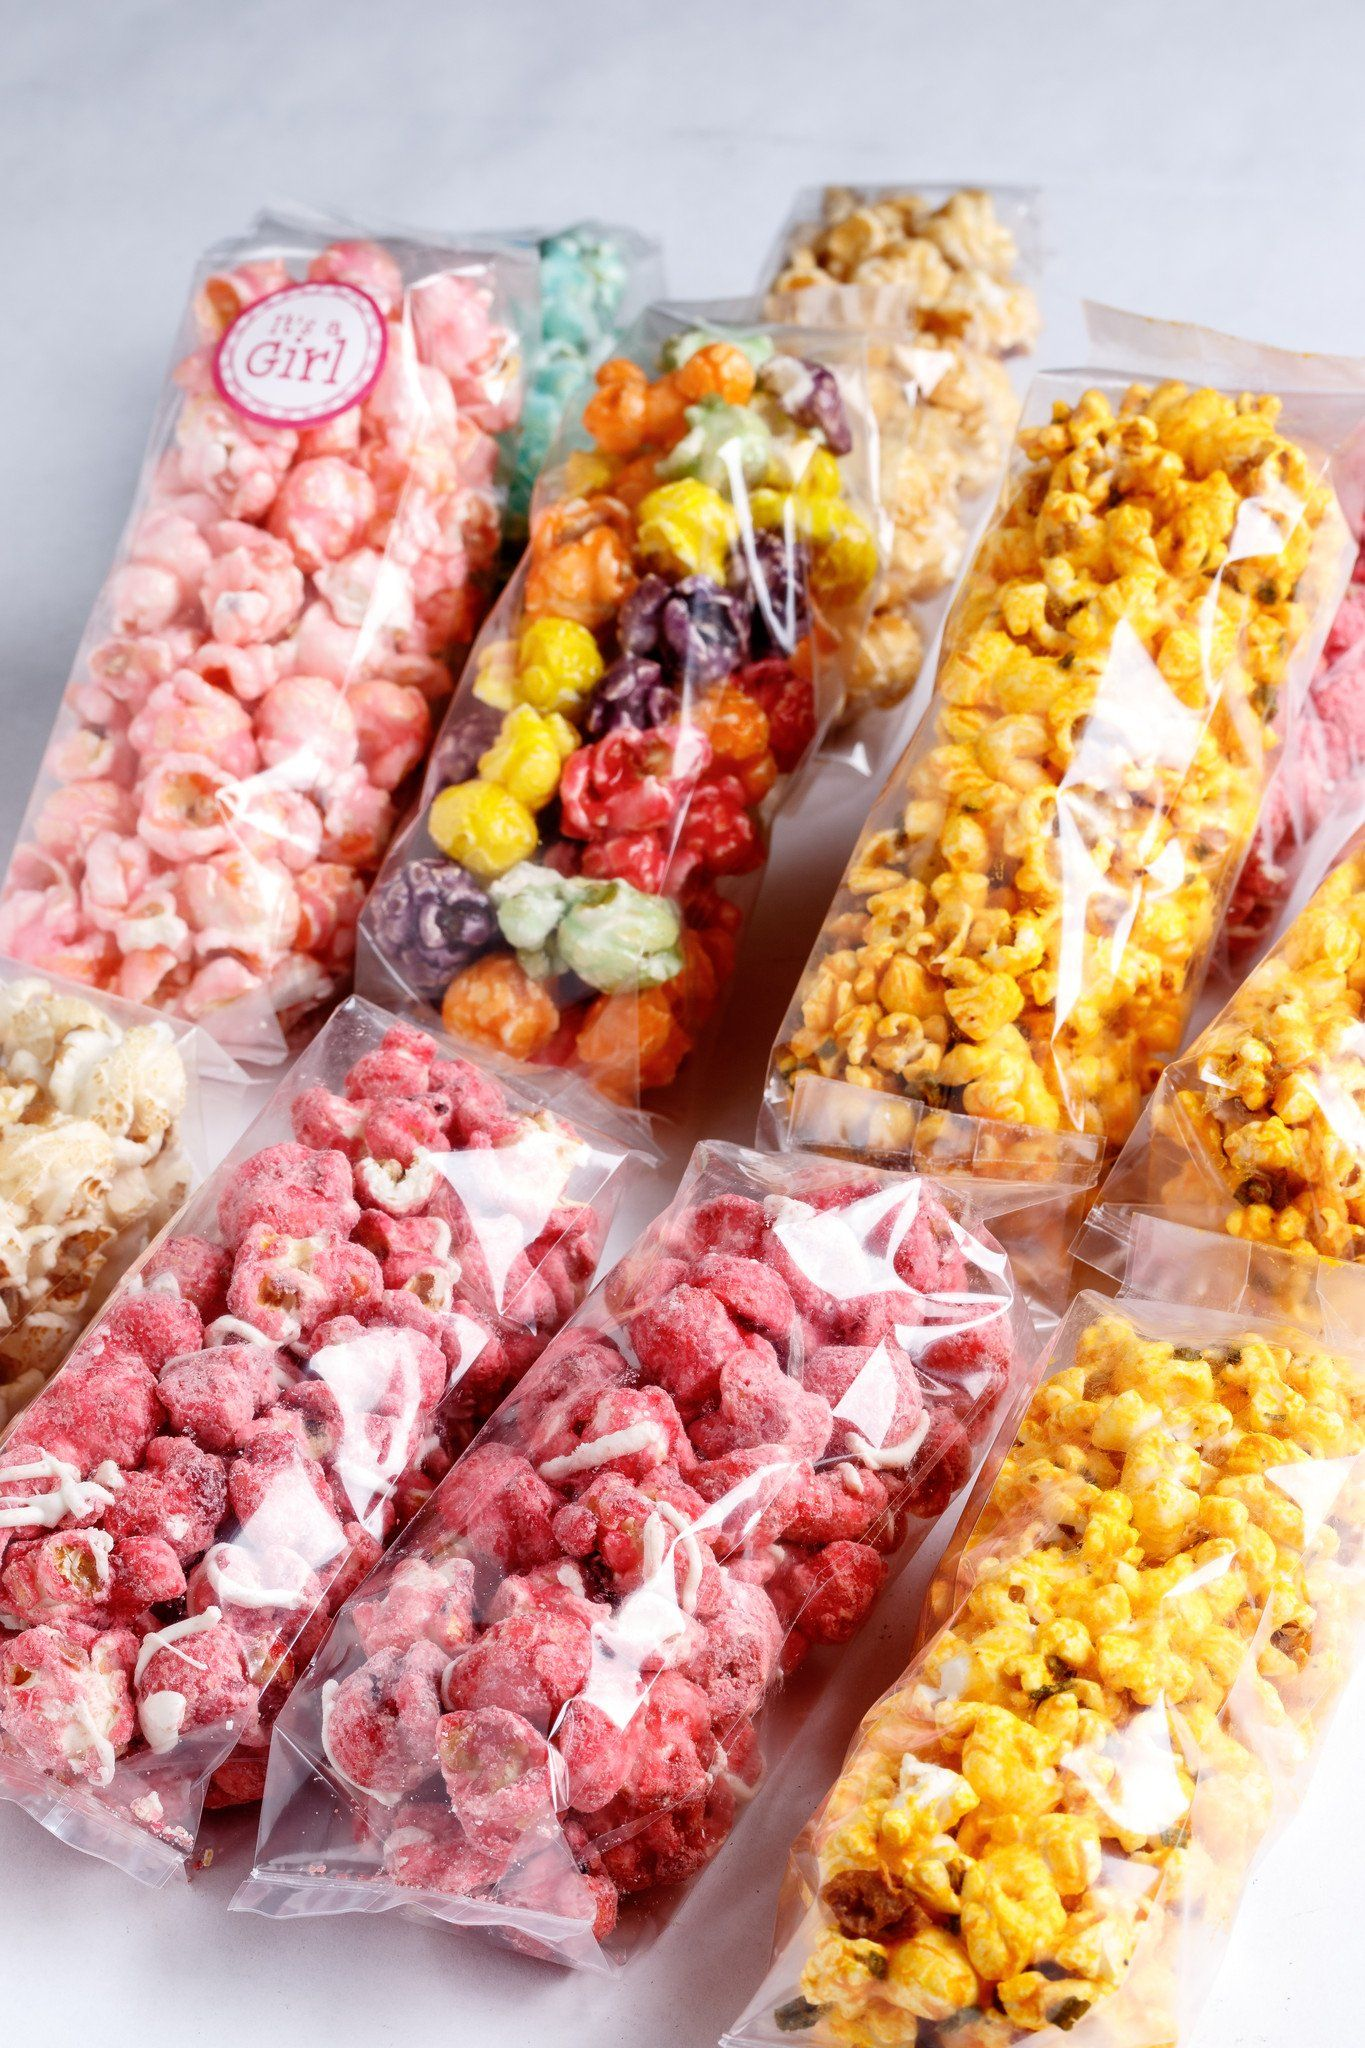 Popcorn Favor Size Bags 50 Pk In 2020 Popcorn Favors Food